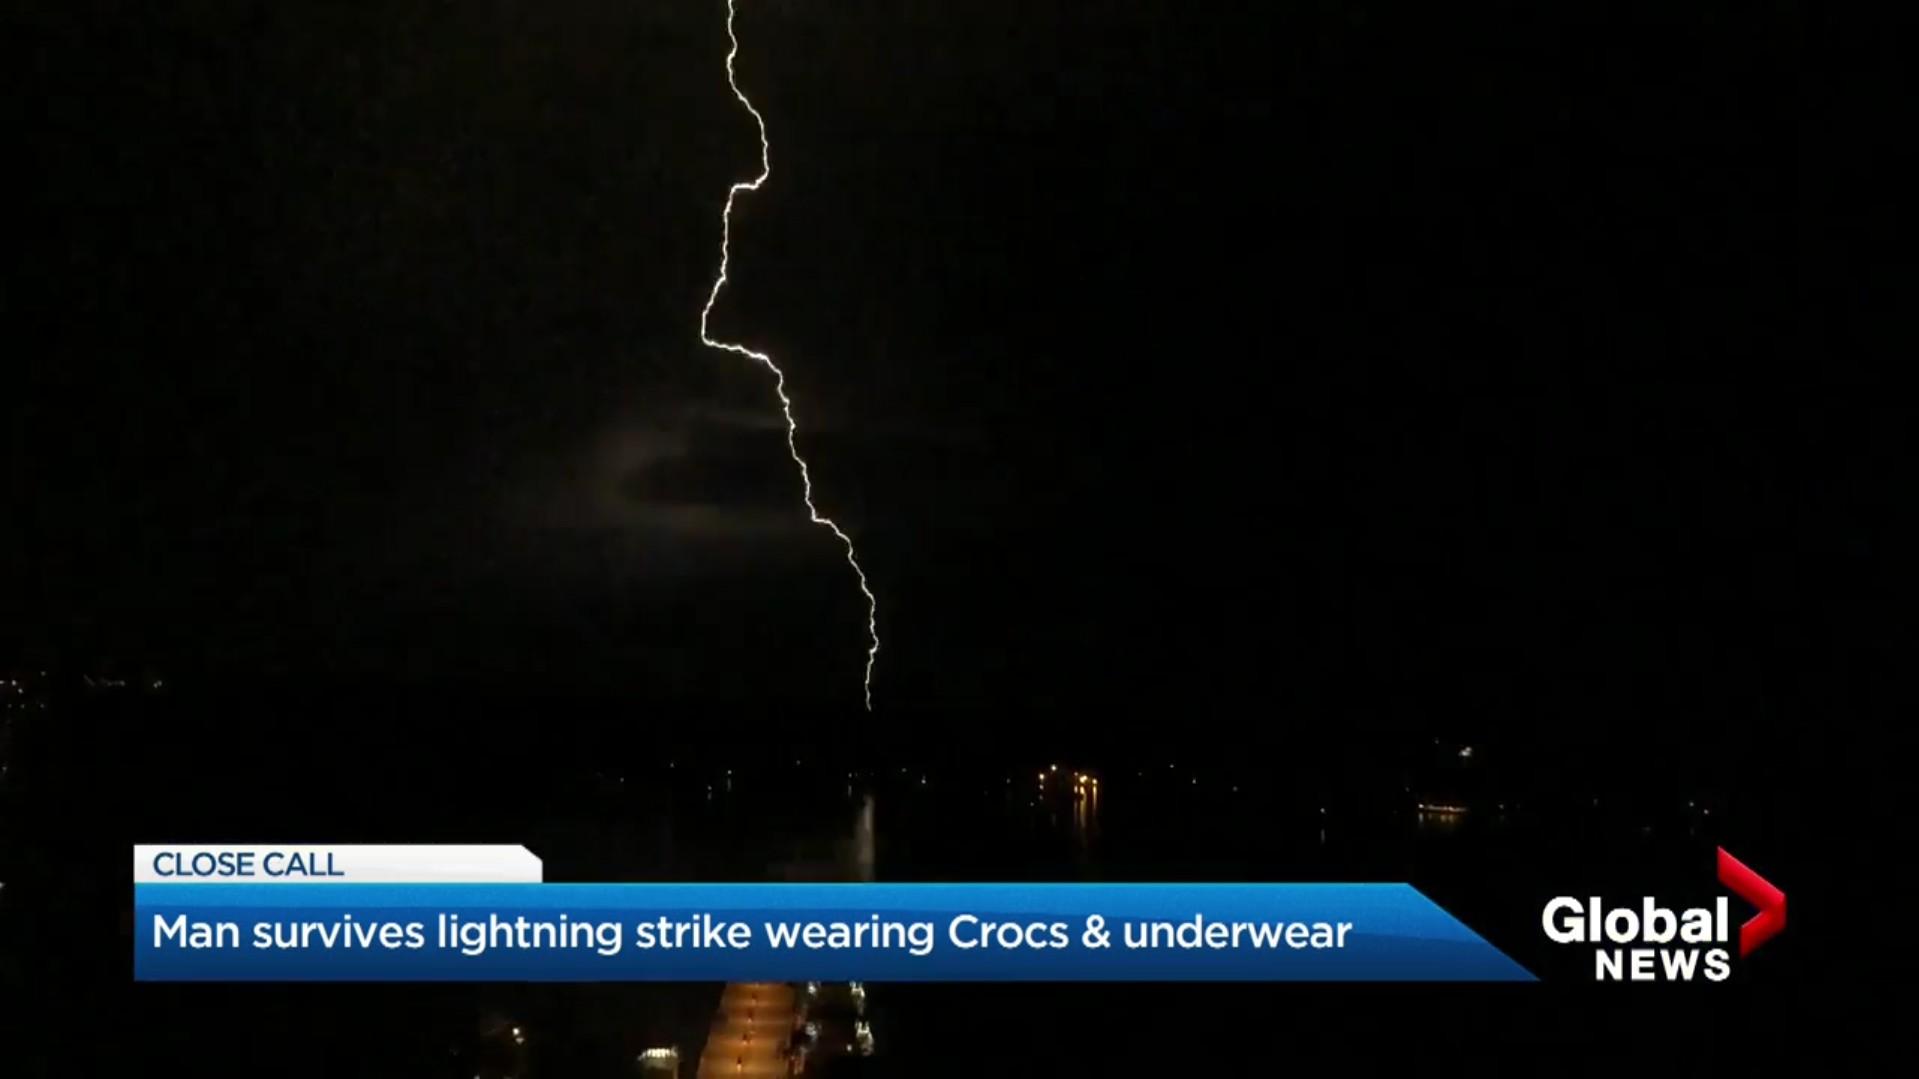 Man survives lightning strike wearing Crocs & underwear